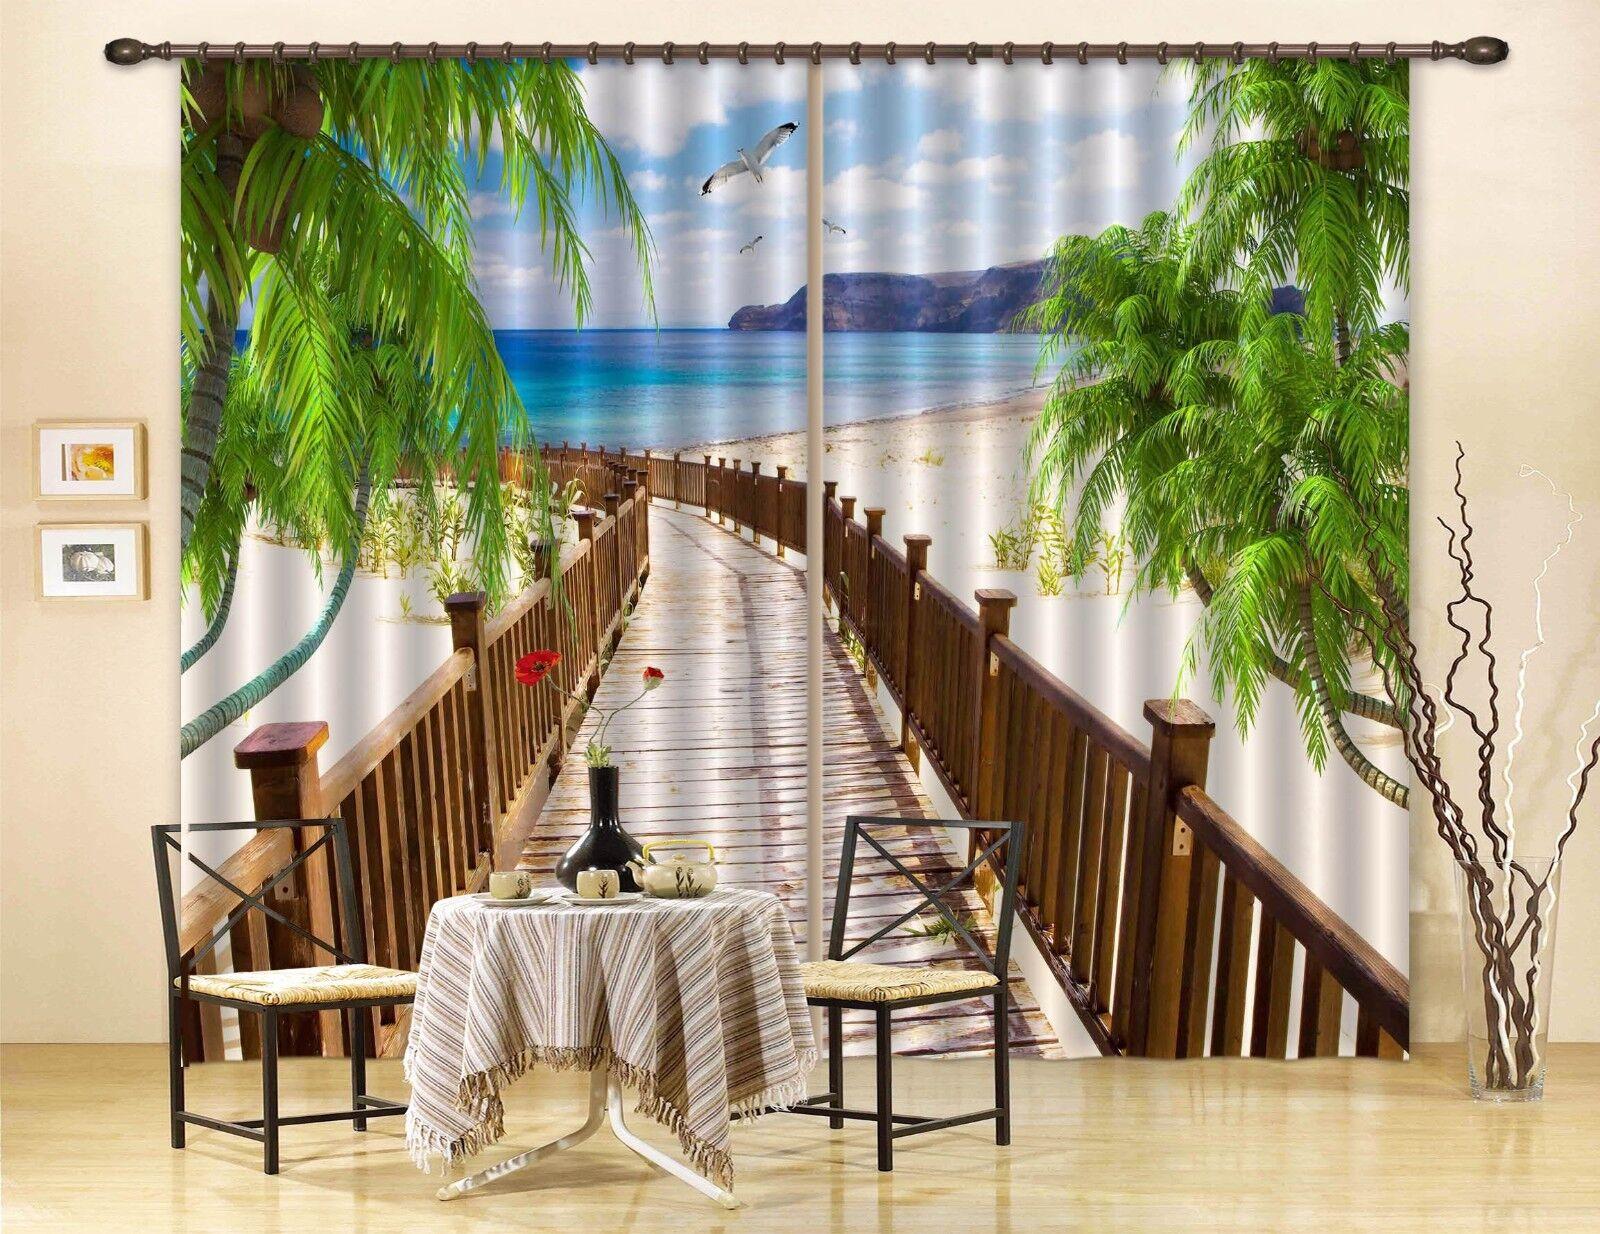 Vista de playa 3D 3 Cortinas de impresión de cortina de foto Blockout Tela Cortinas Ventana au